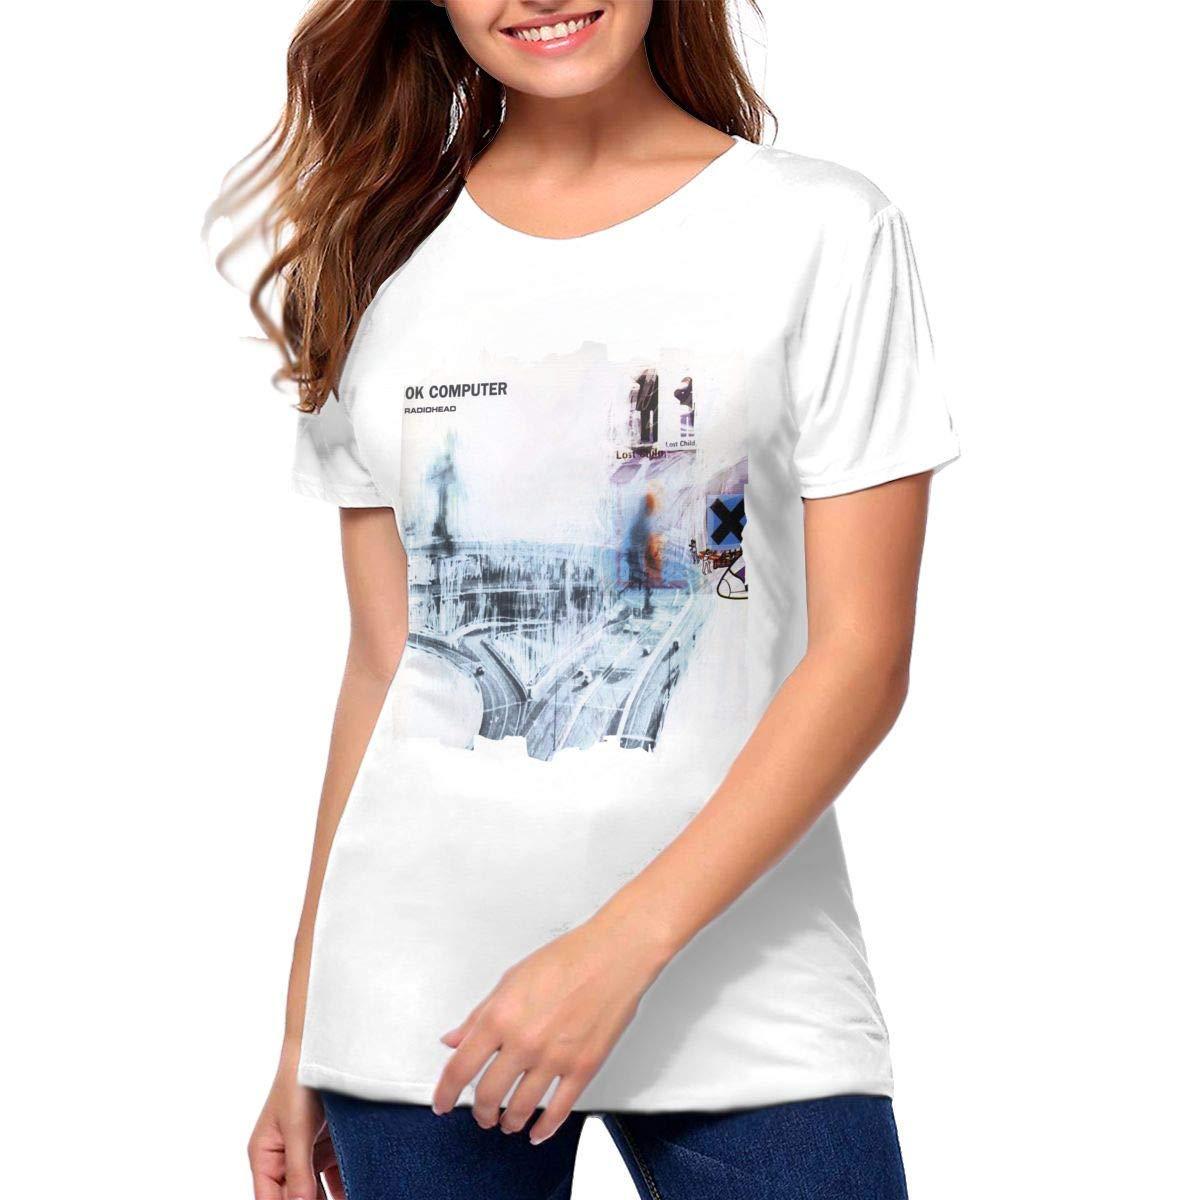 Herbertwburns Radiohead Ok Computer T Shirts Womans Tees 5620